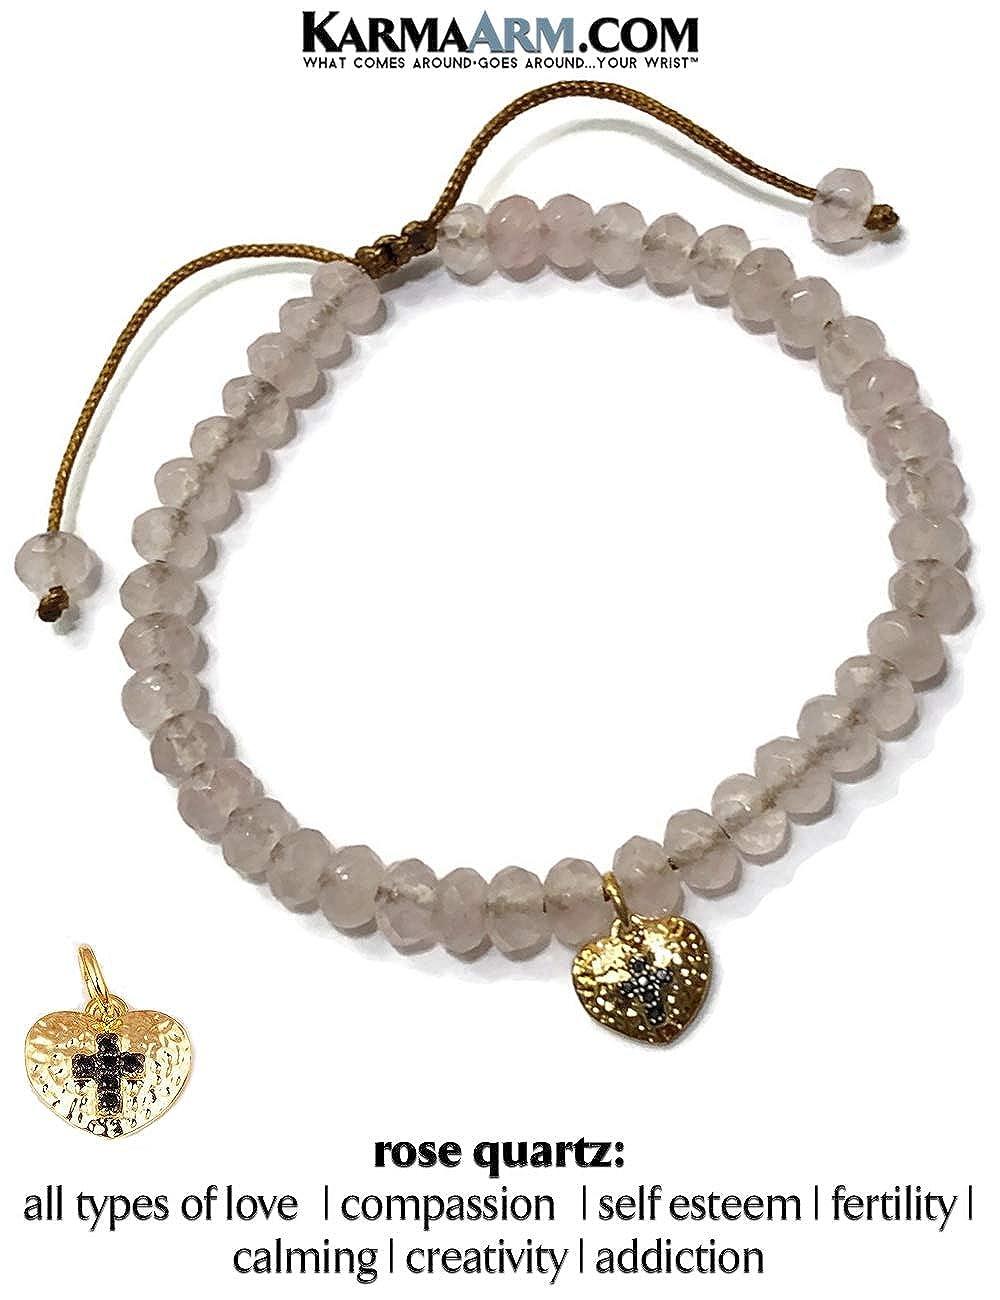 Natural Rose Quartz Meditation Spiritual Pull Tie Mantra Reiki Healing Energy Boho Chakra Wrap Yoga Jewelry /& Gifts KarmaArm Heart Charm Bracelet Cross in Heart